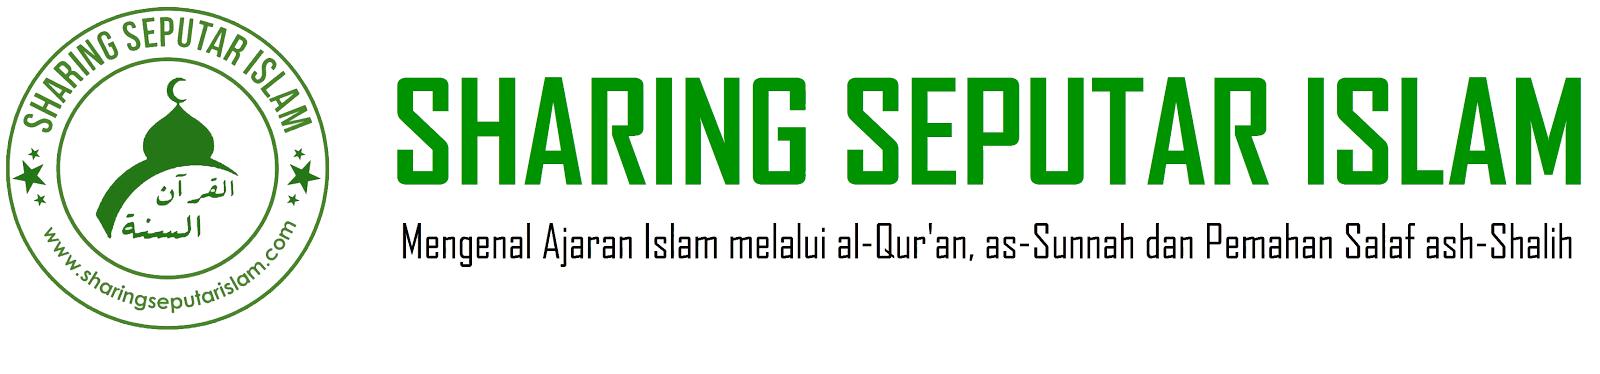 Sharing Seputar Islam